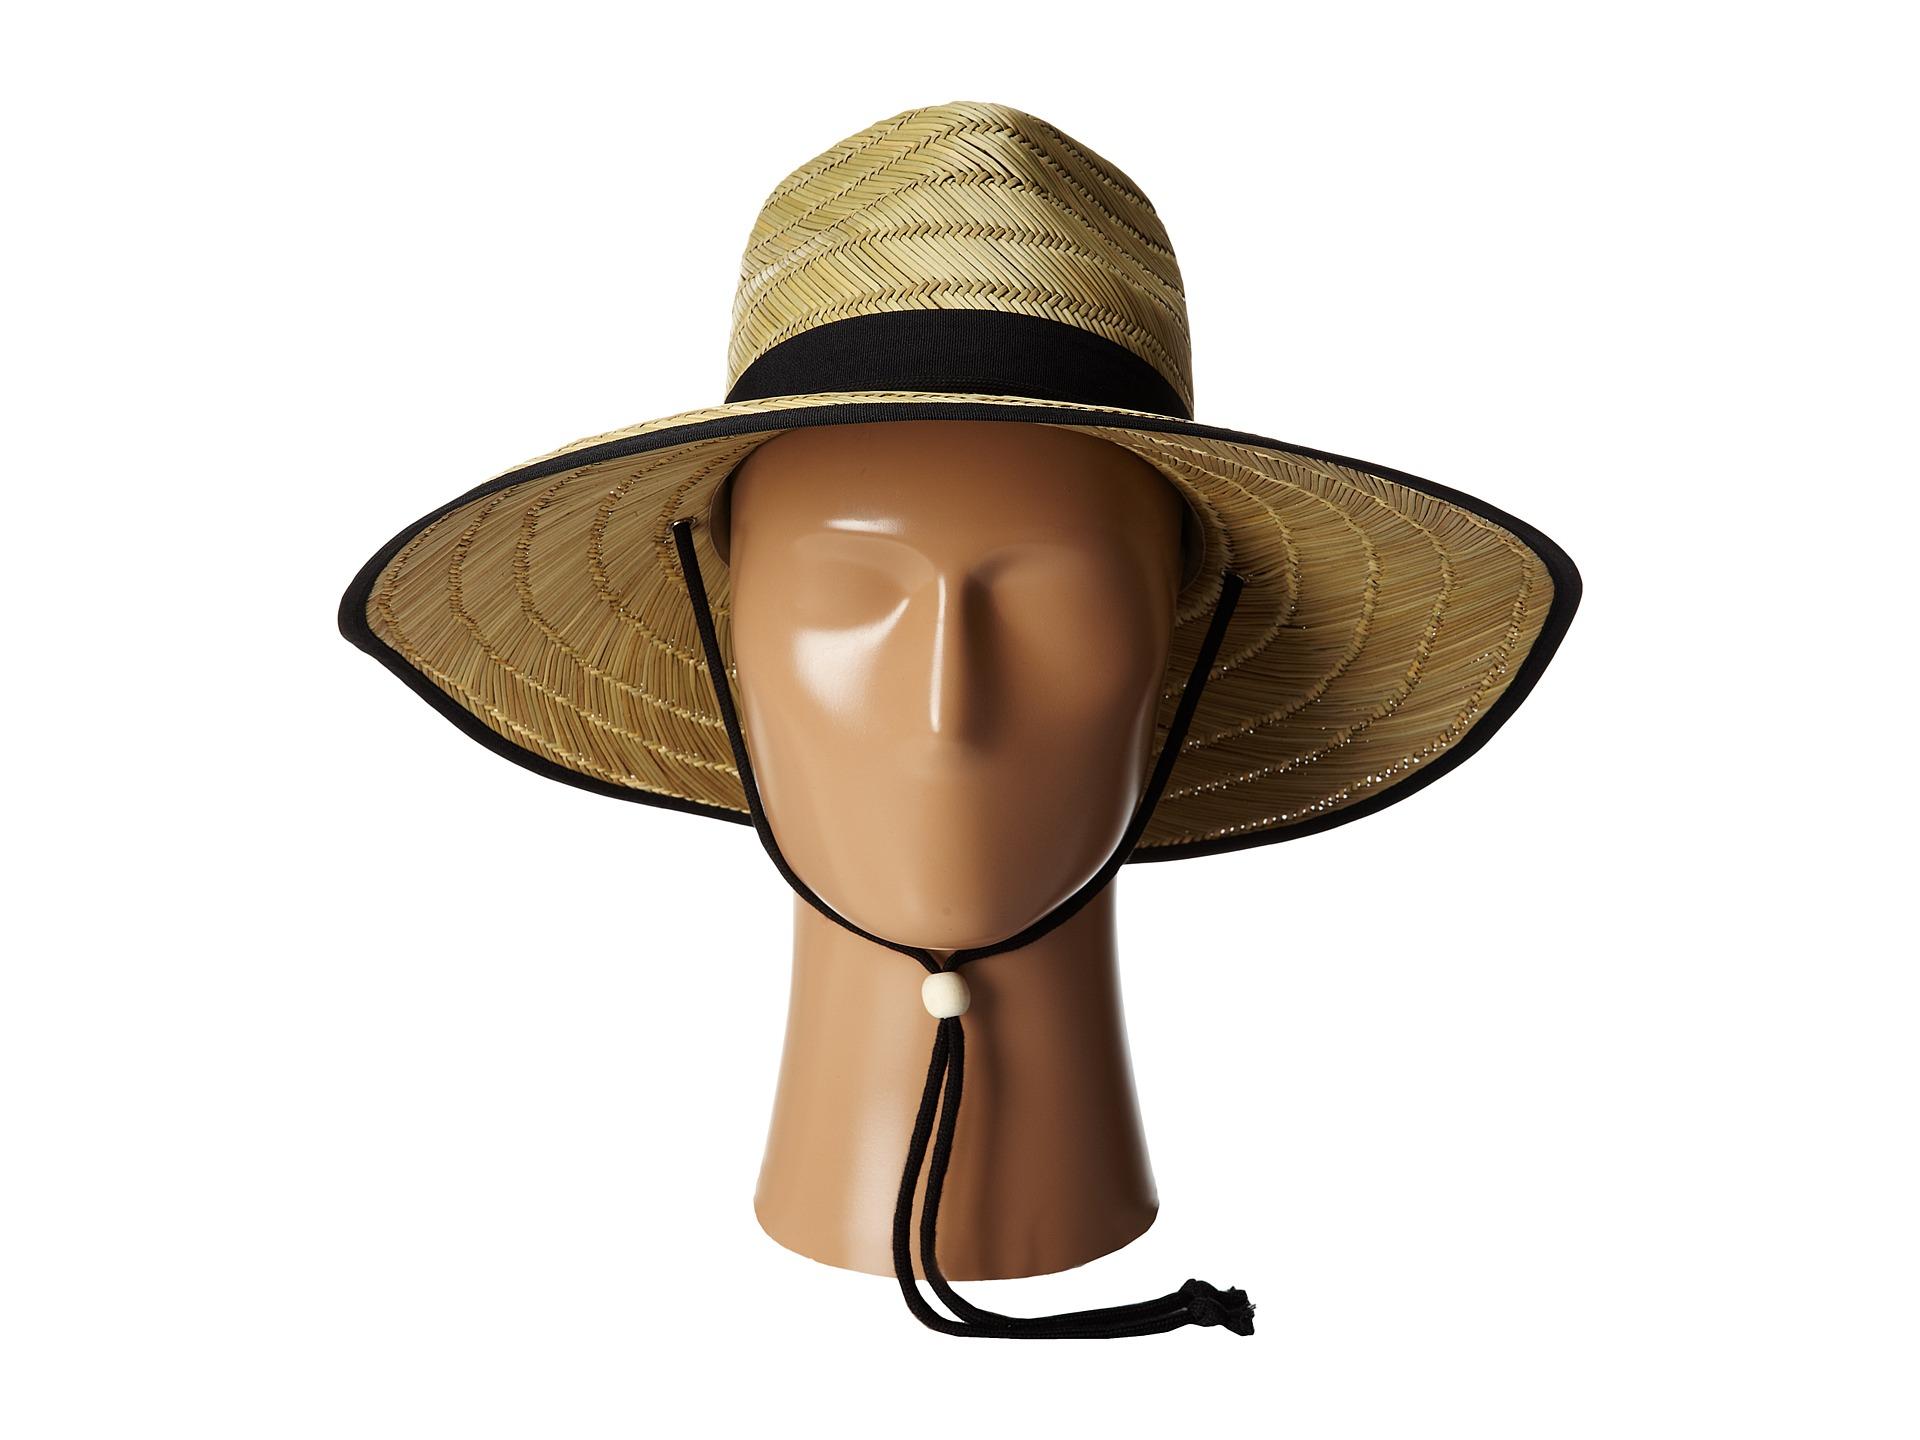 ec1cc03a2094a San Diego Hat Company RSL5556 Rush Straw Lifeguard w  Band and Chin Cord -  Zappos.com Free Shipping BOTH Ways